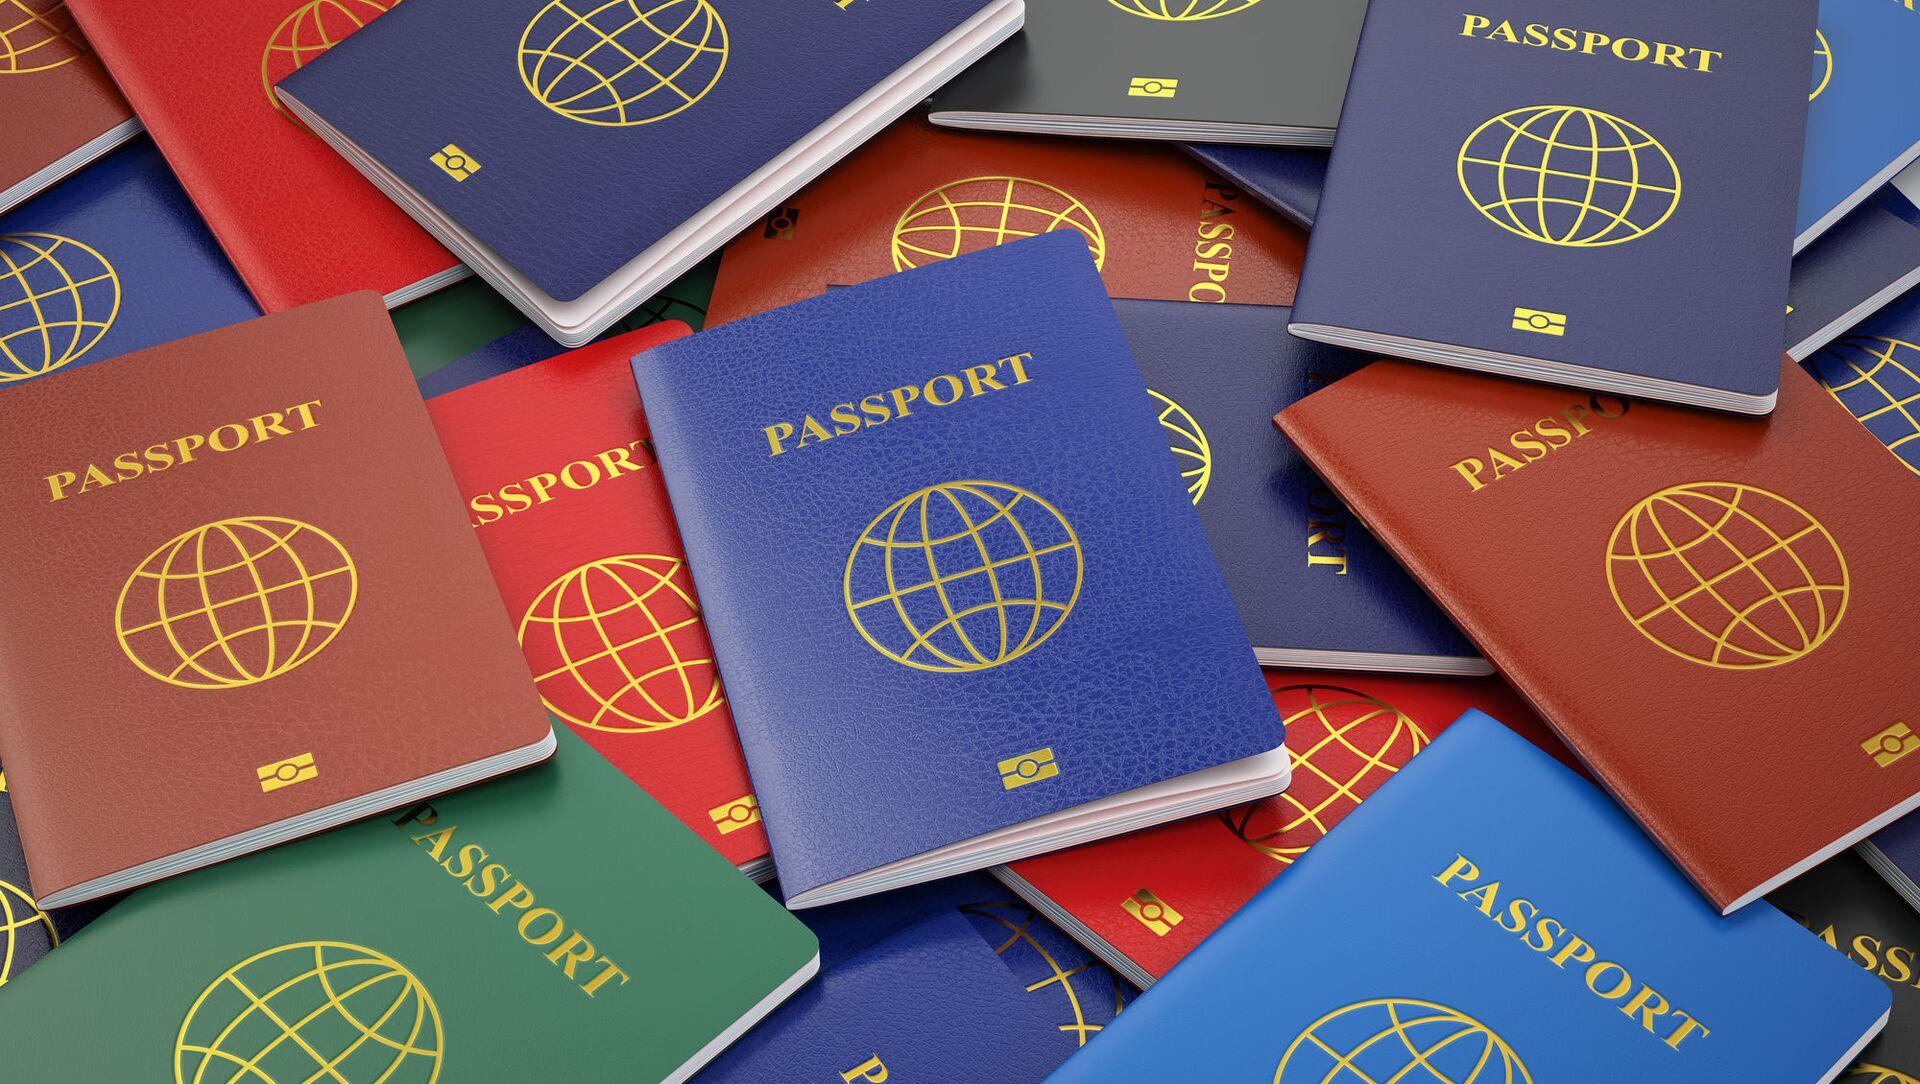 Paszporty - Sputnik Polska, 1920, 20.05.2021